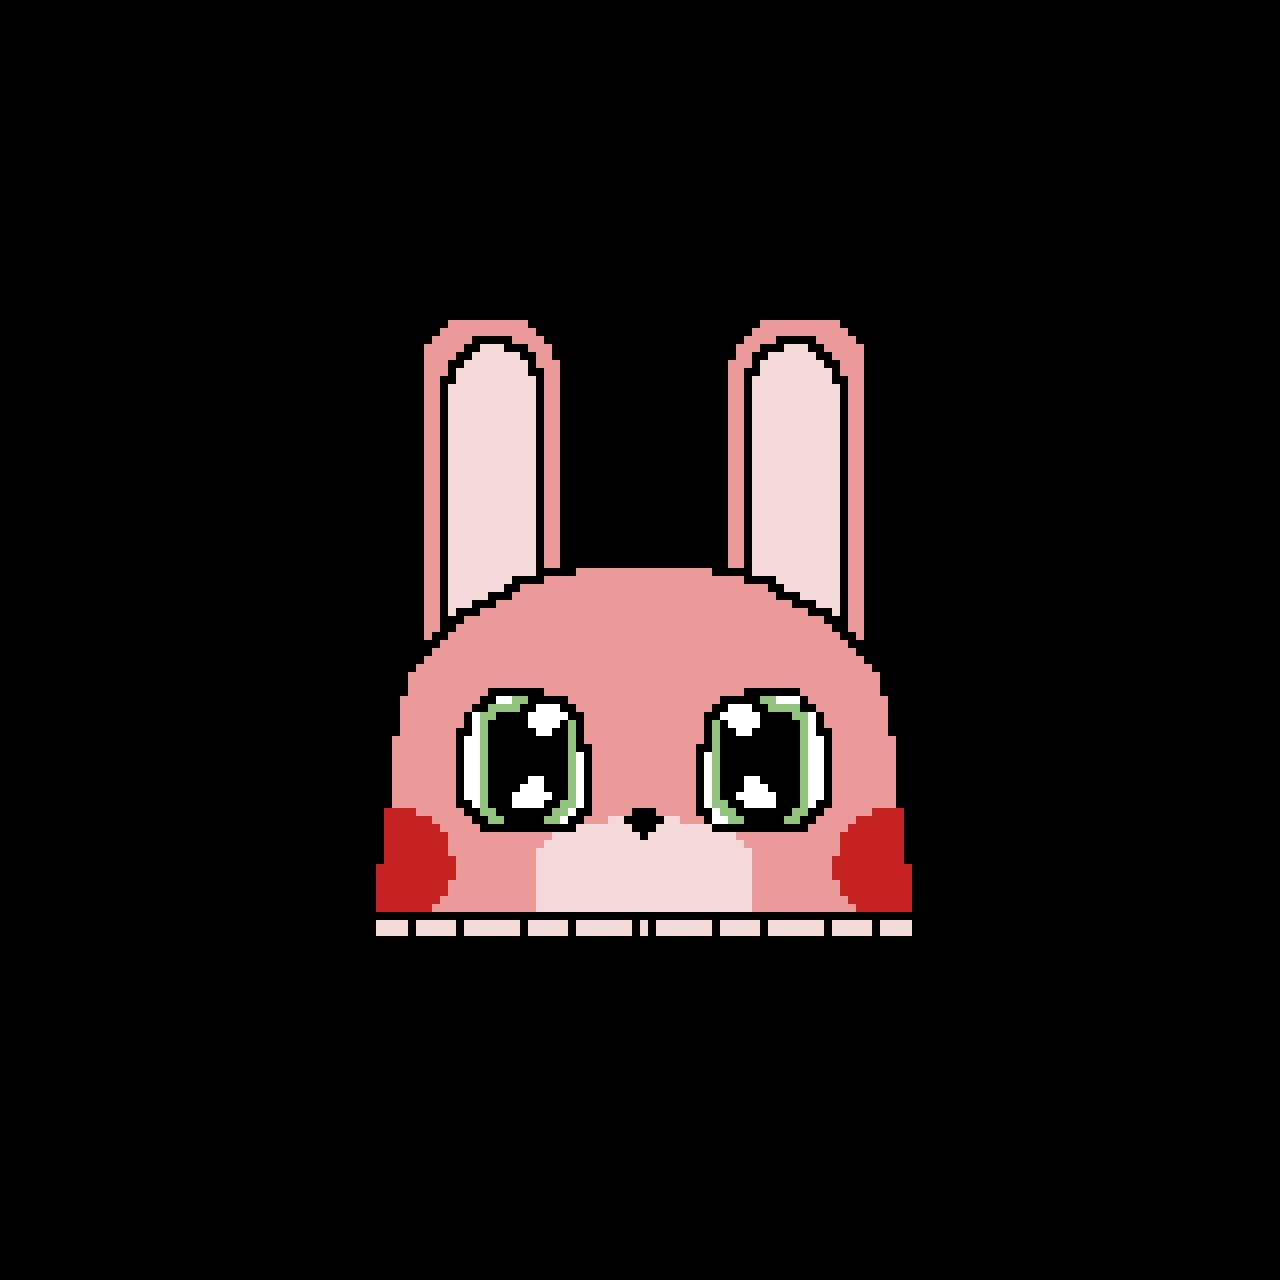 Bonnet The Bunny Slipper (LOL!!!! If This Gets 10 Likes I'll Draw Bon Bon The Bunny Slipper)